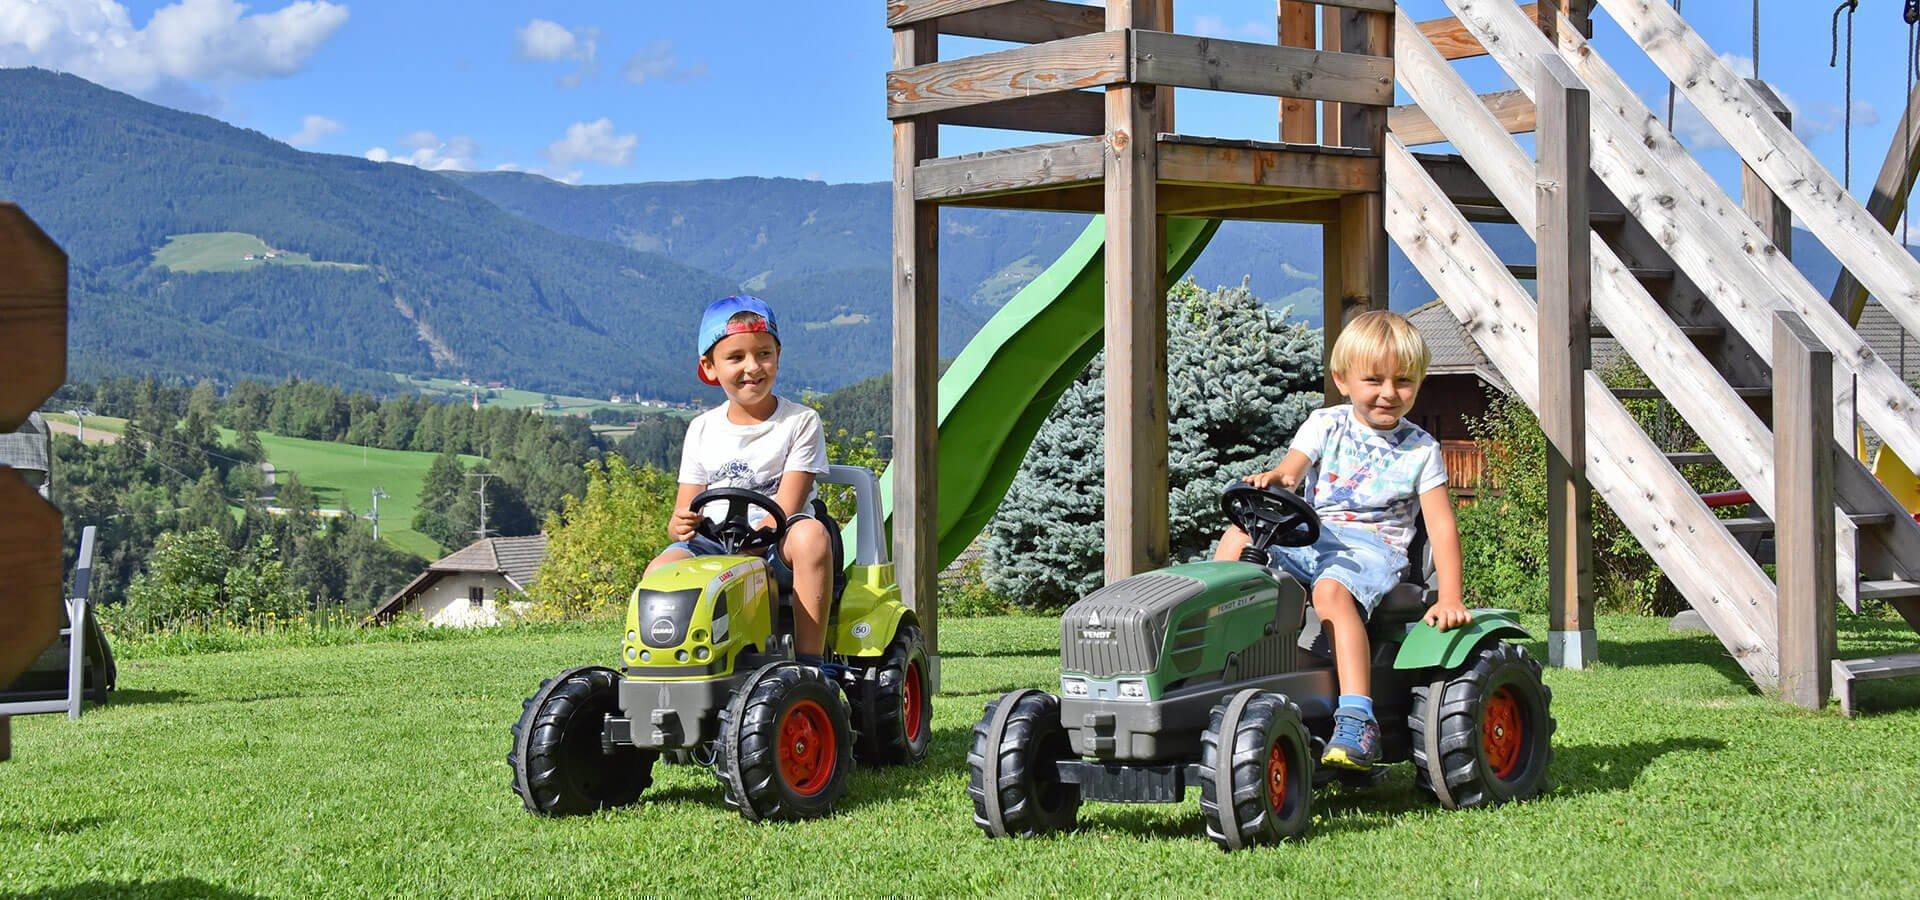 Erlebnissommer im Pustertal - Urlaub am Fuchshof in Südtirol